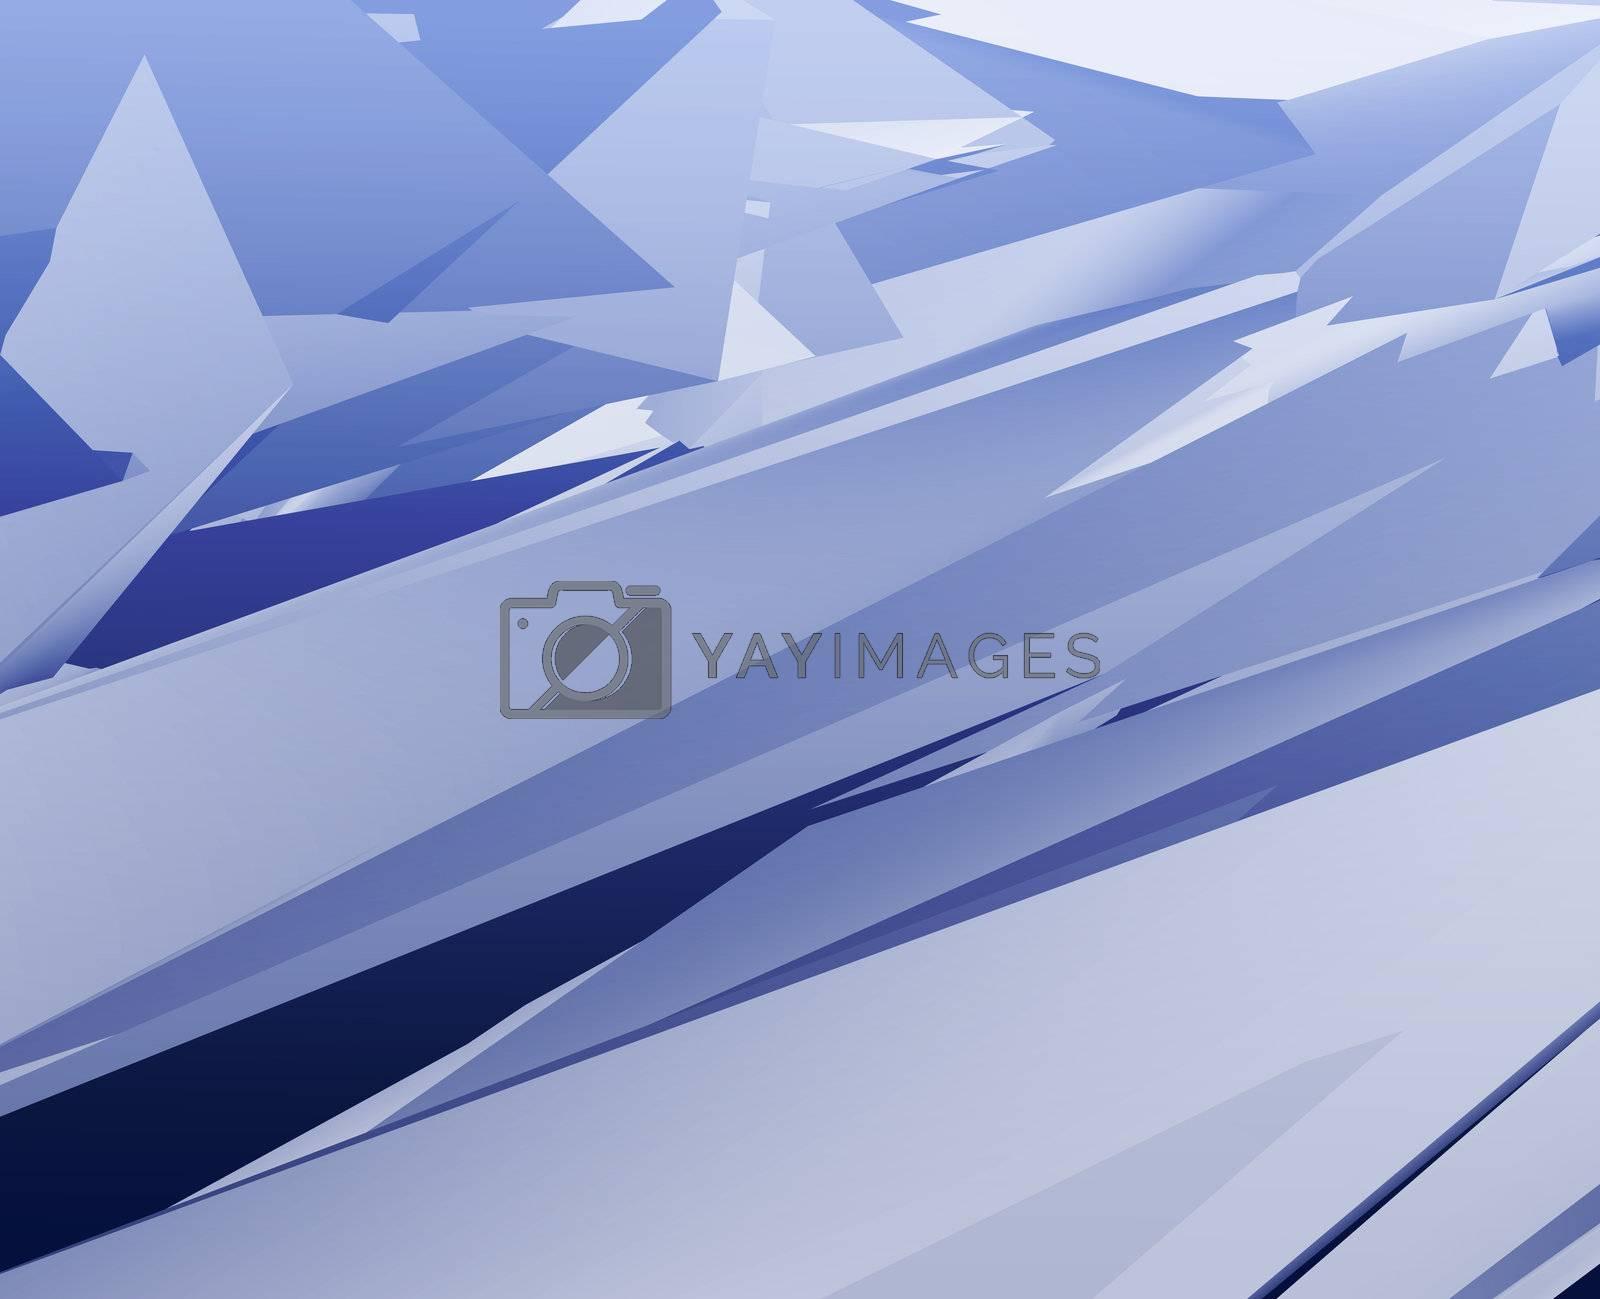 Abstract illustration background of sleek geometric shapes